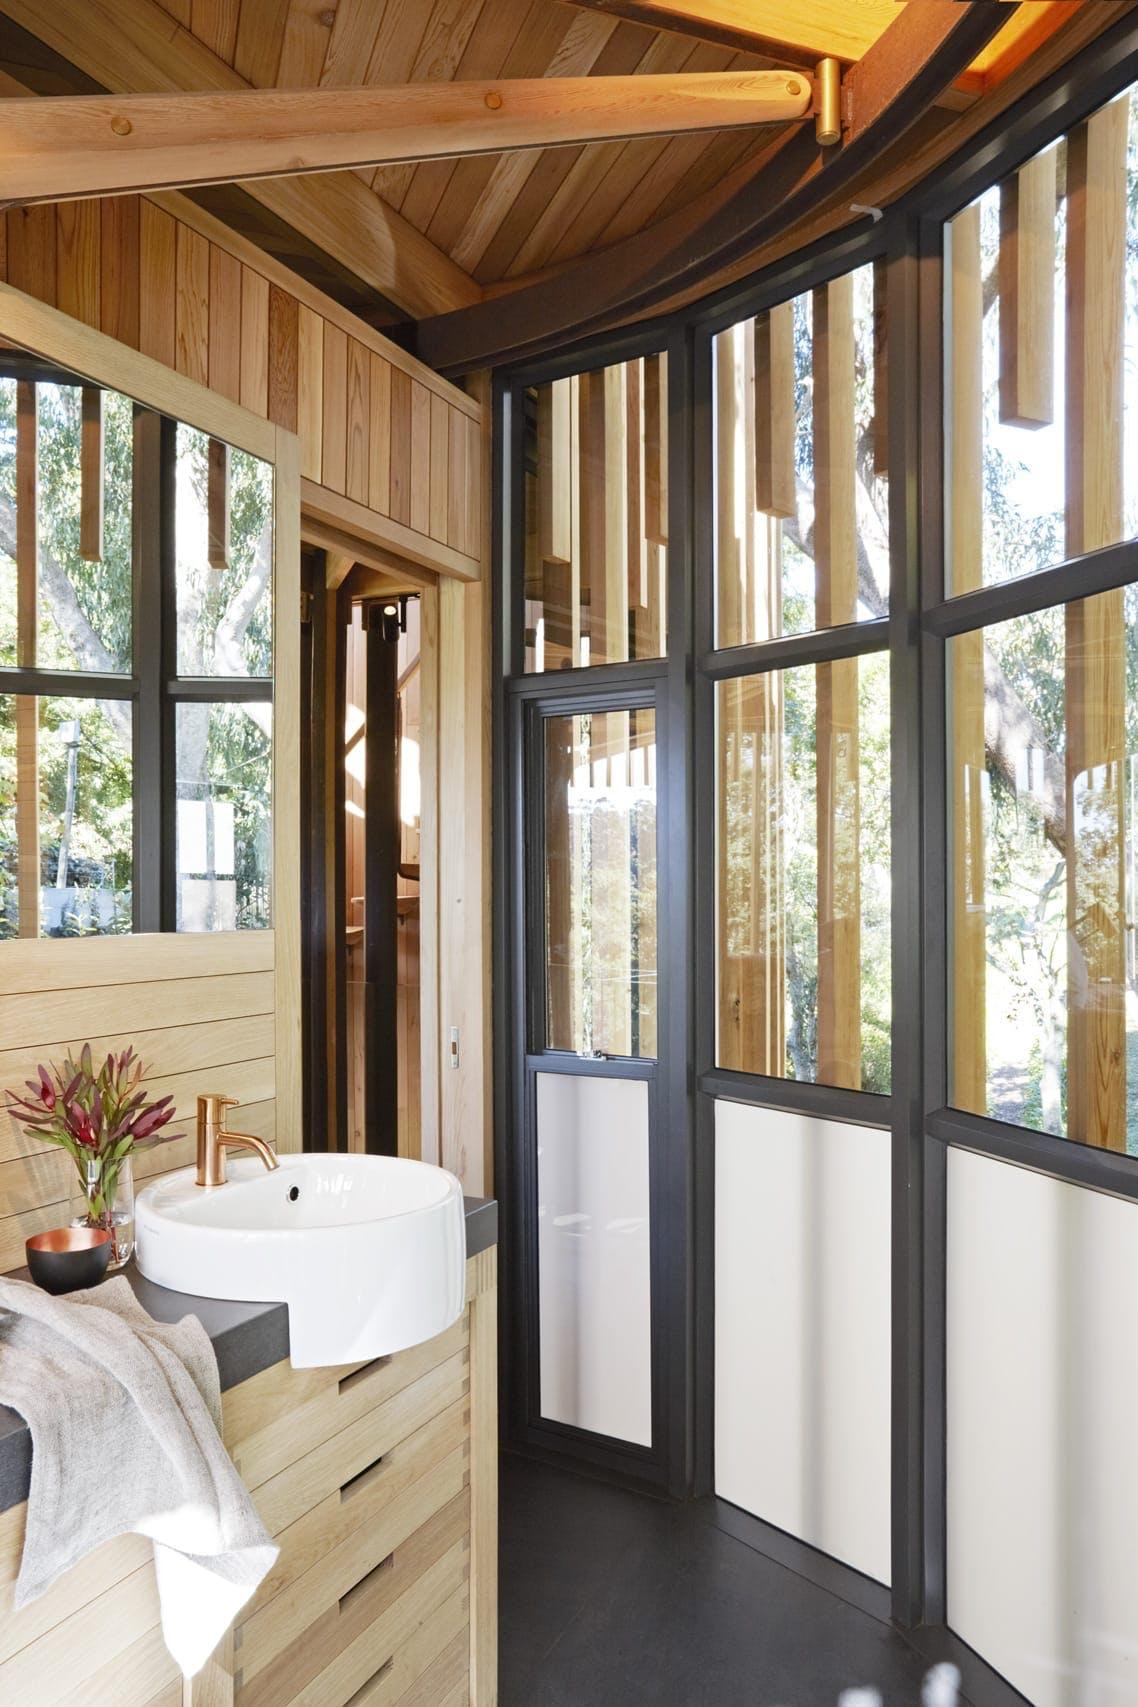 Badeværelse træhus luksus